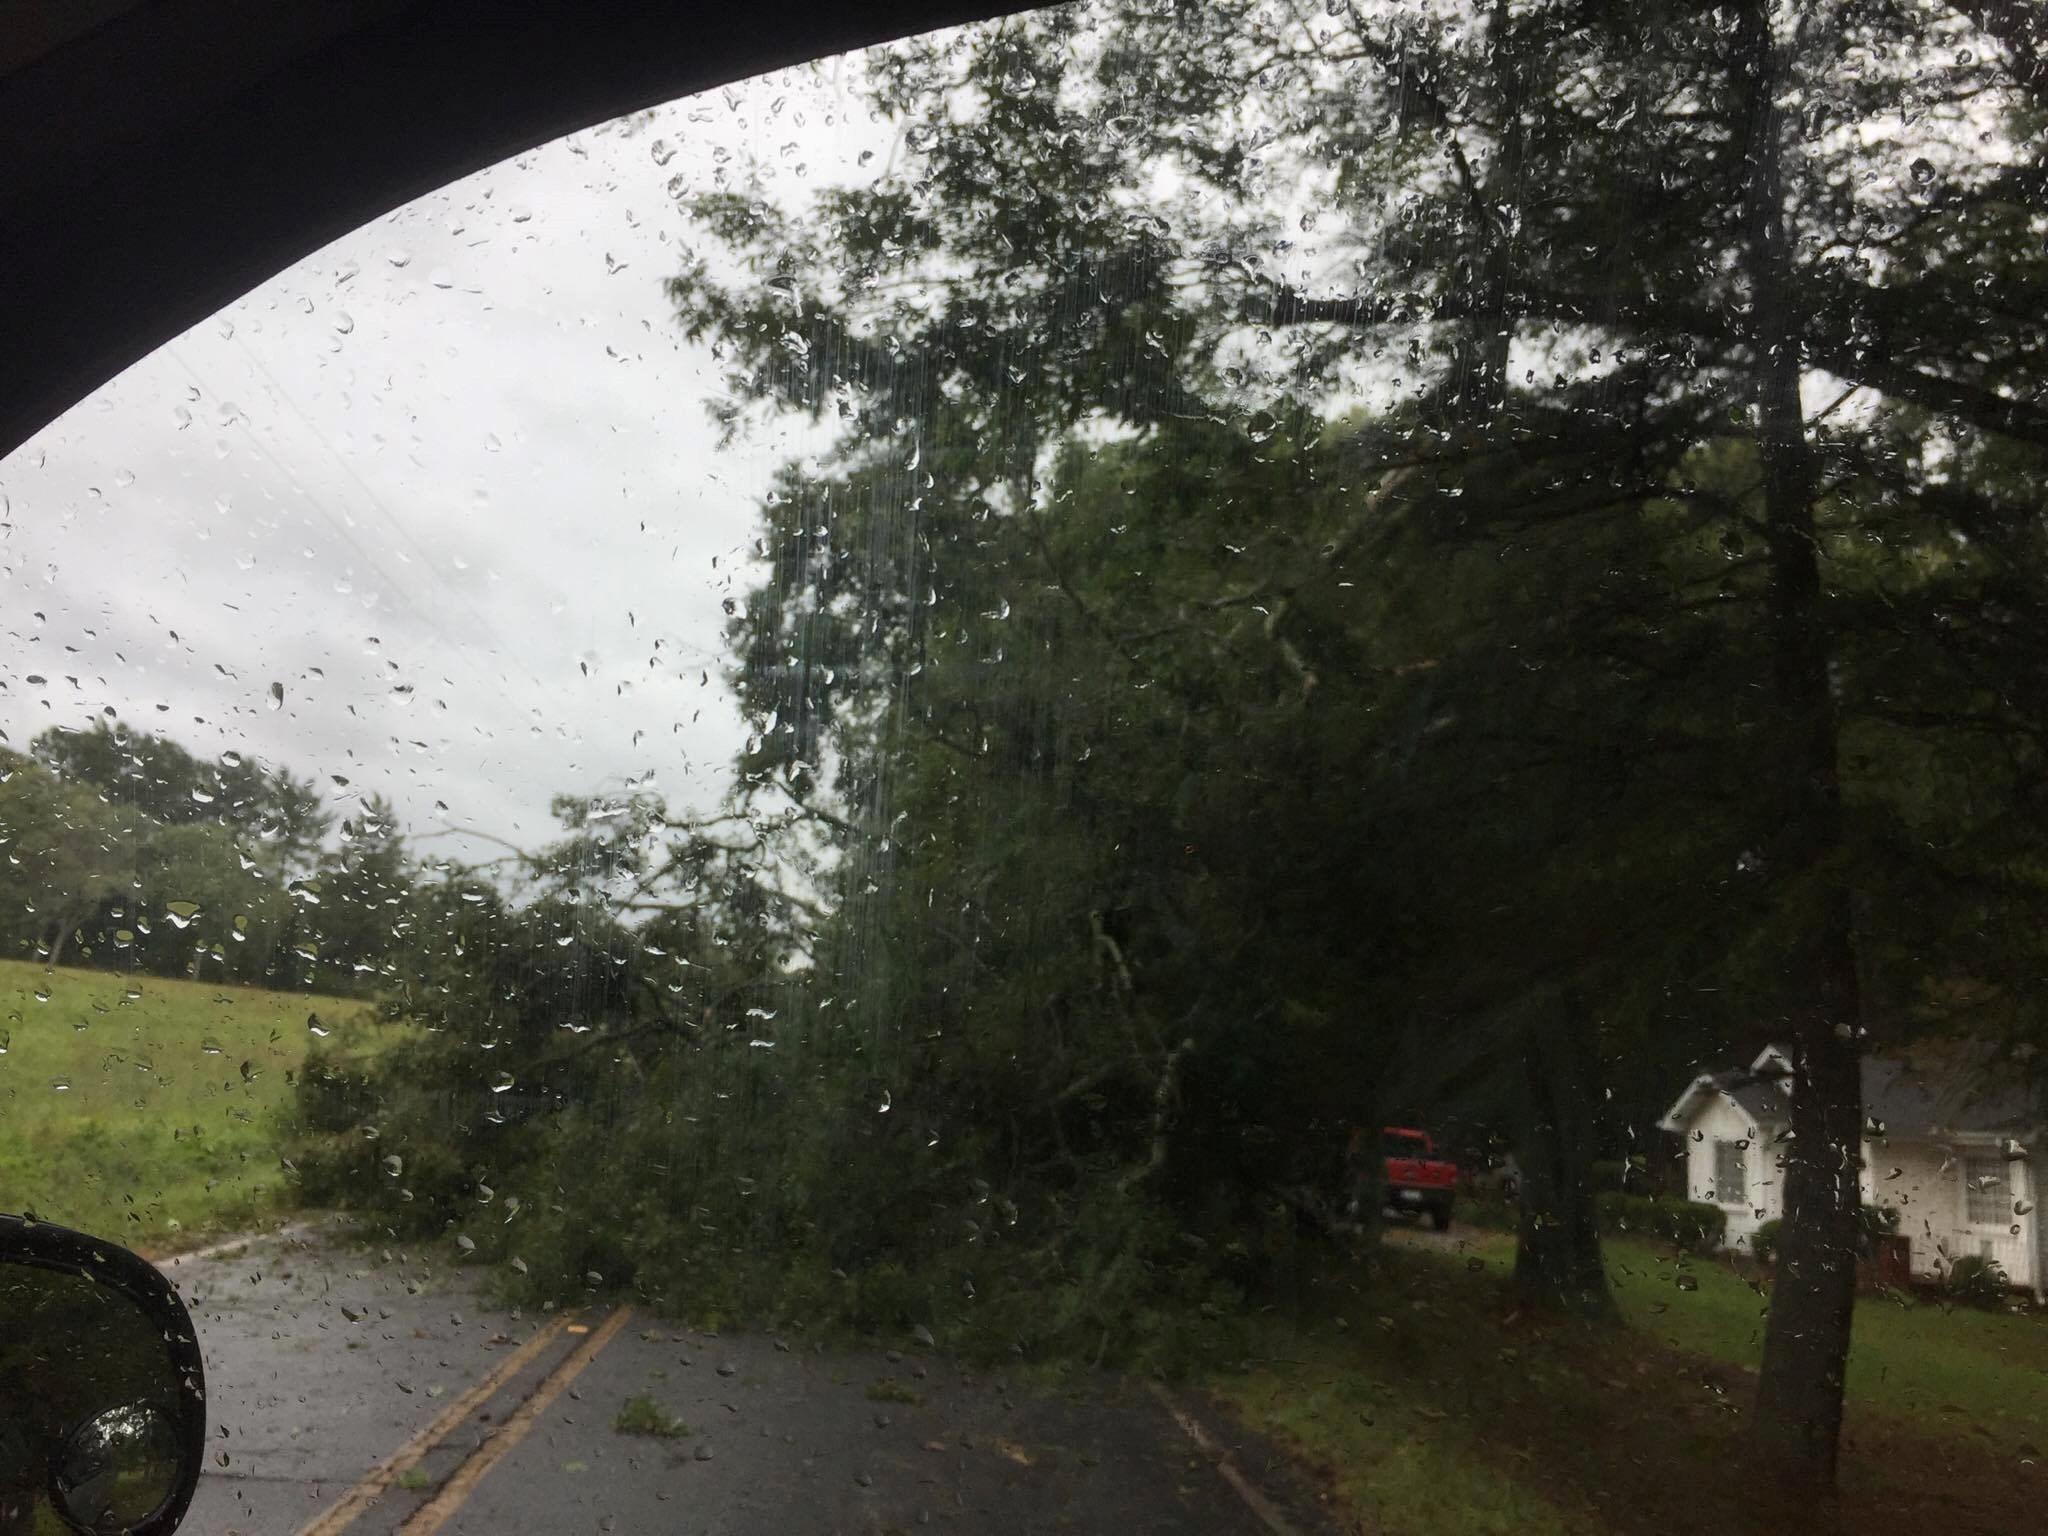 Tree in roadway in Liberty. (Source: eyewitness)